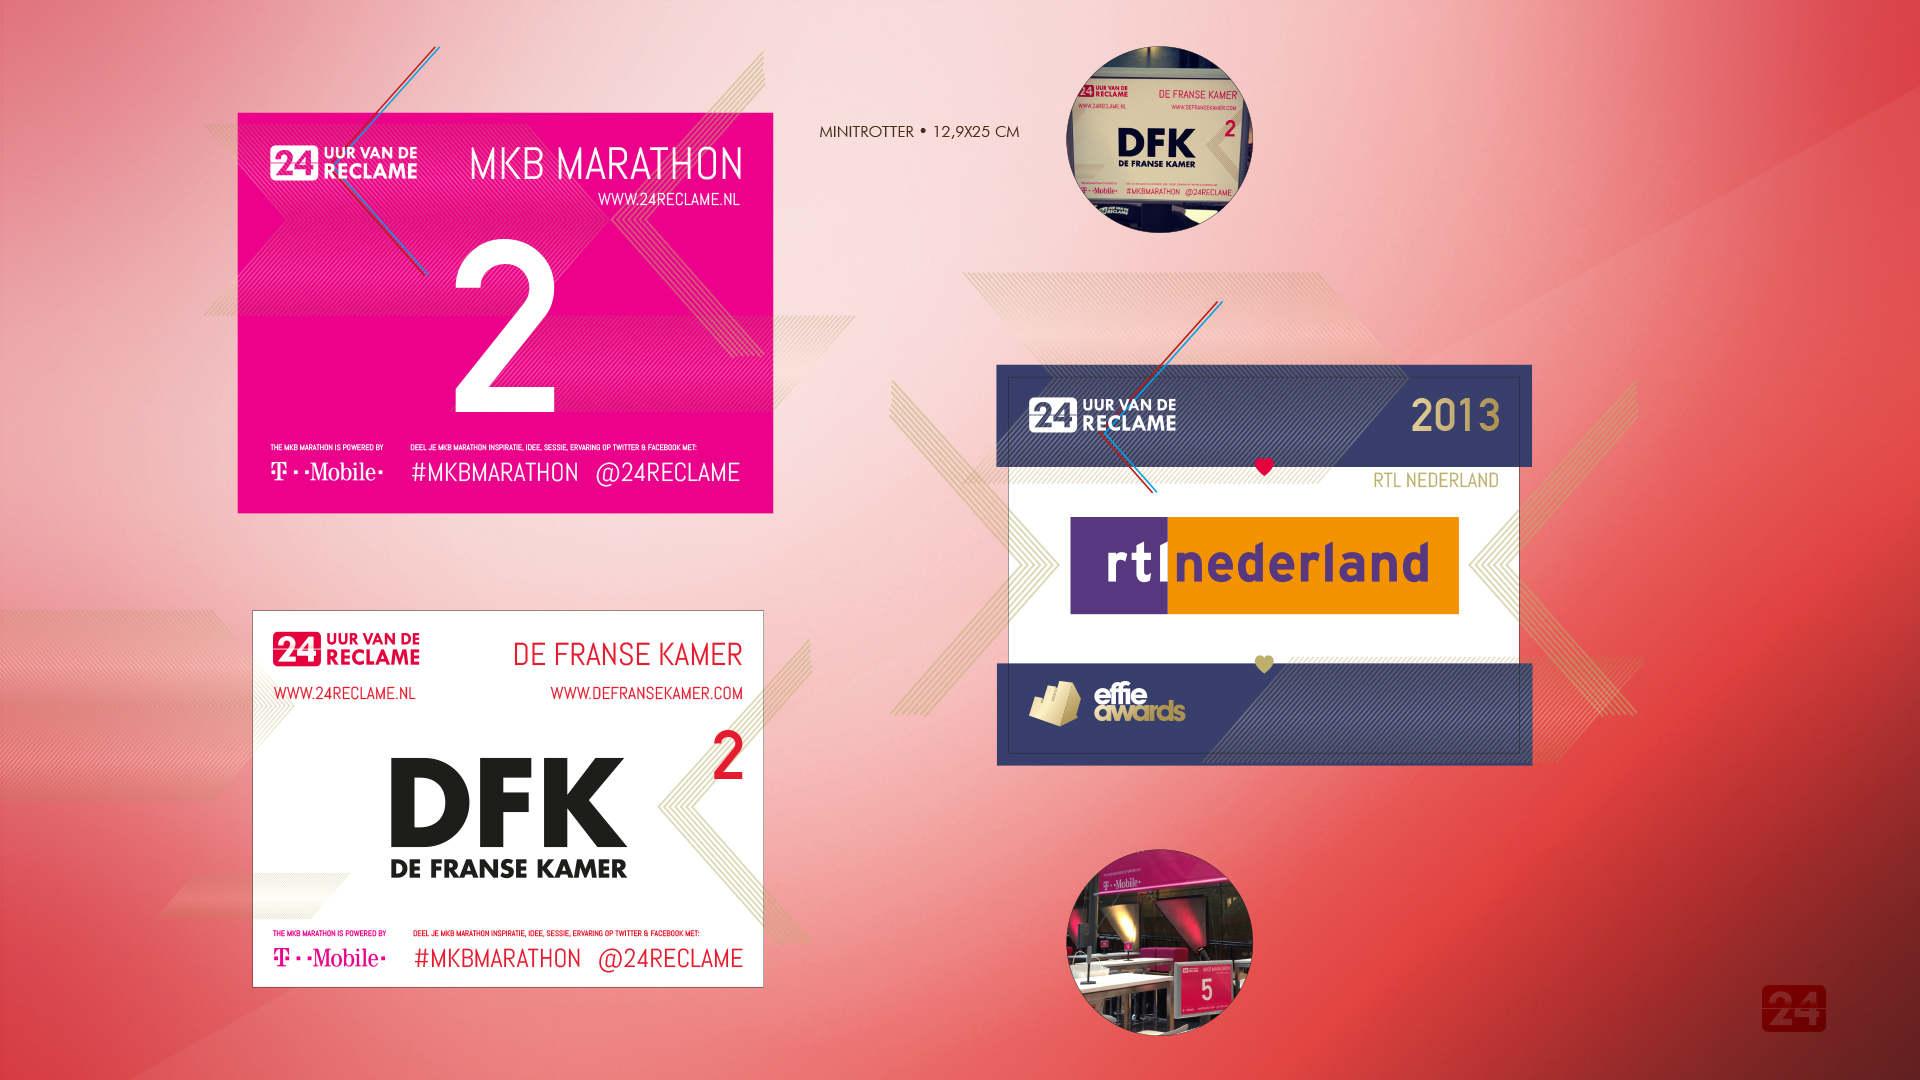 24 Festival. Case. Visuals van rebranding, strategie, communicatie, identity, concept, social media, designs, event. Sham Ramessar